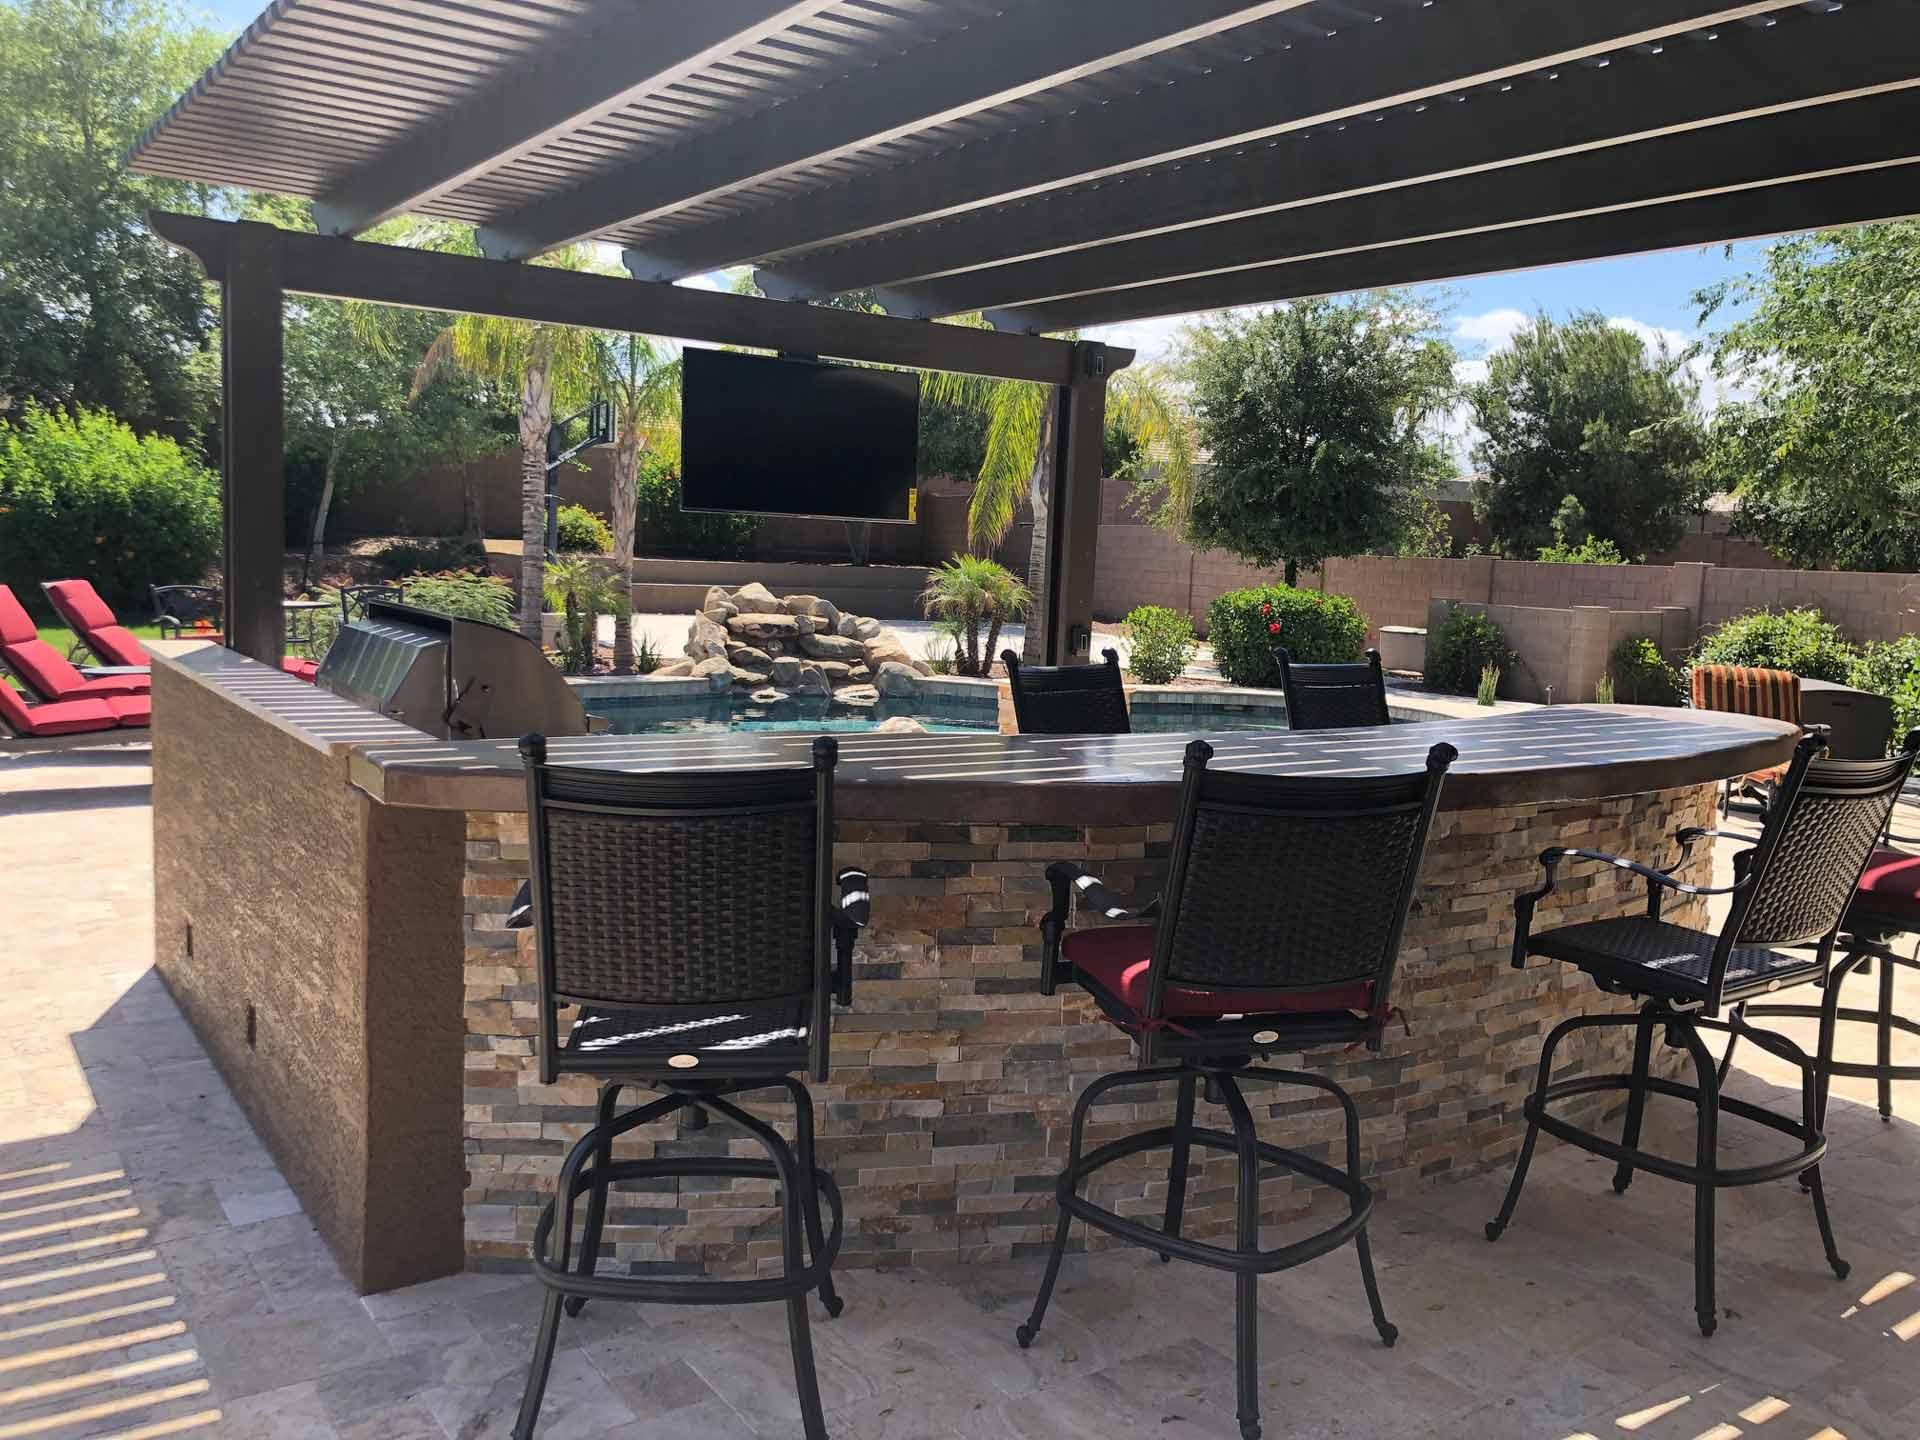 greenstar-eco-outdoor-kitchens-slider-9